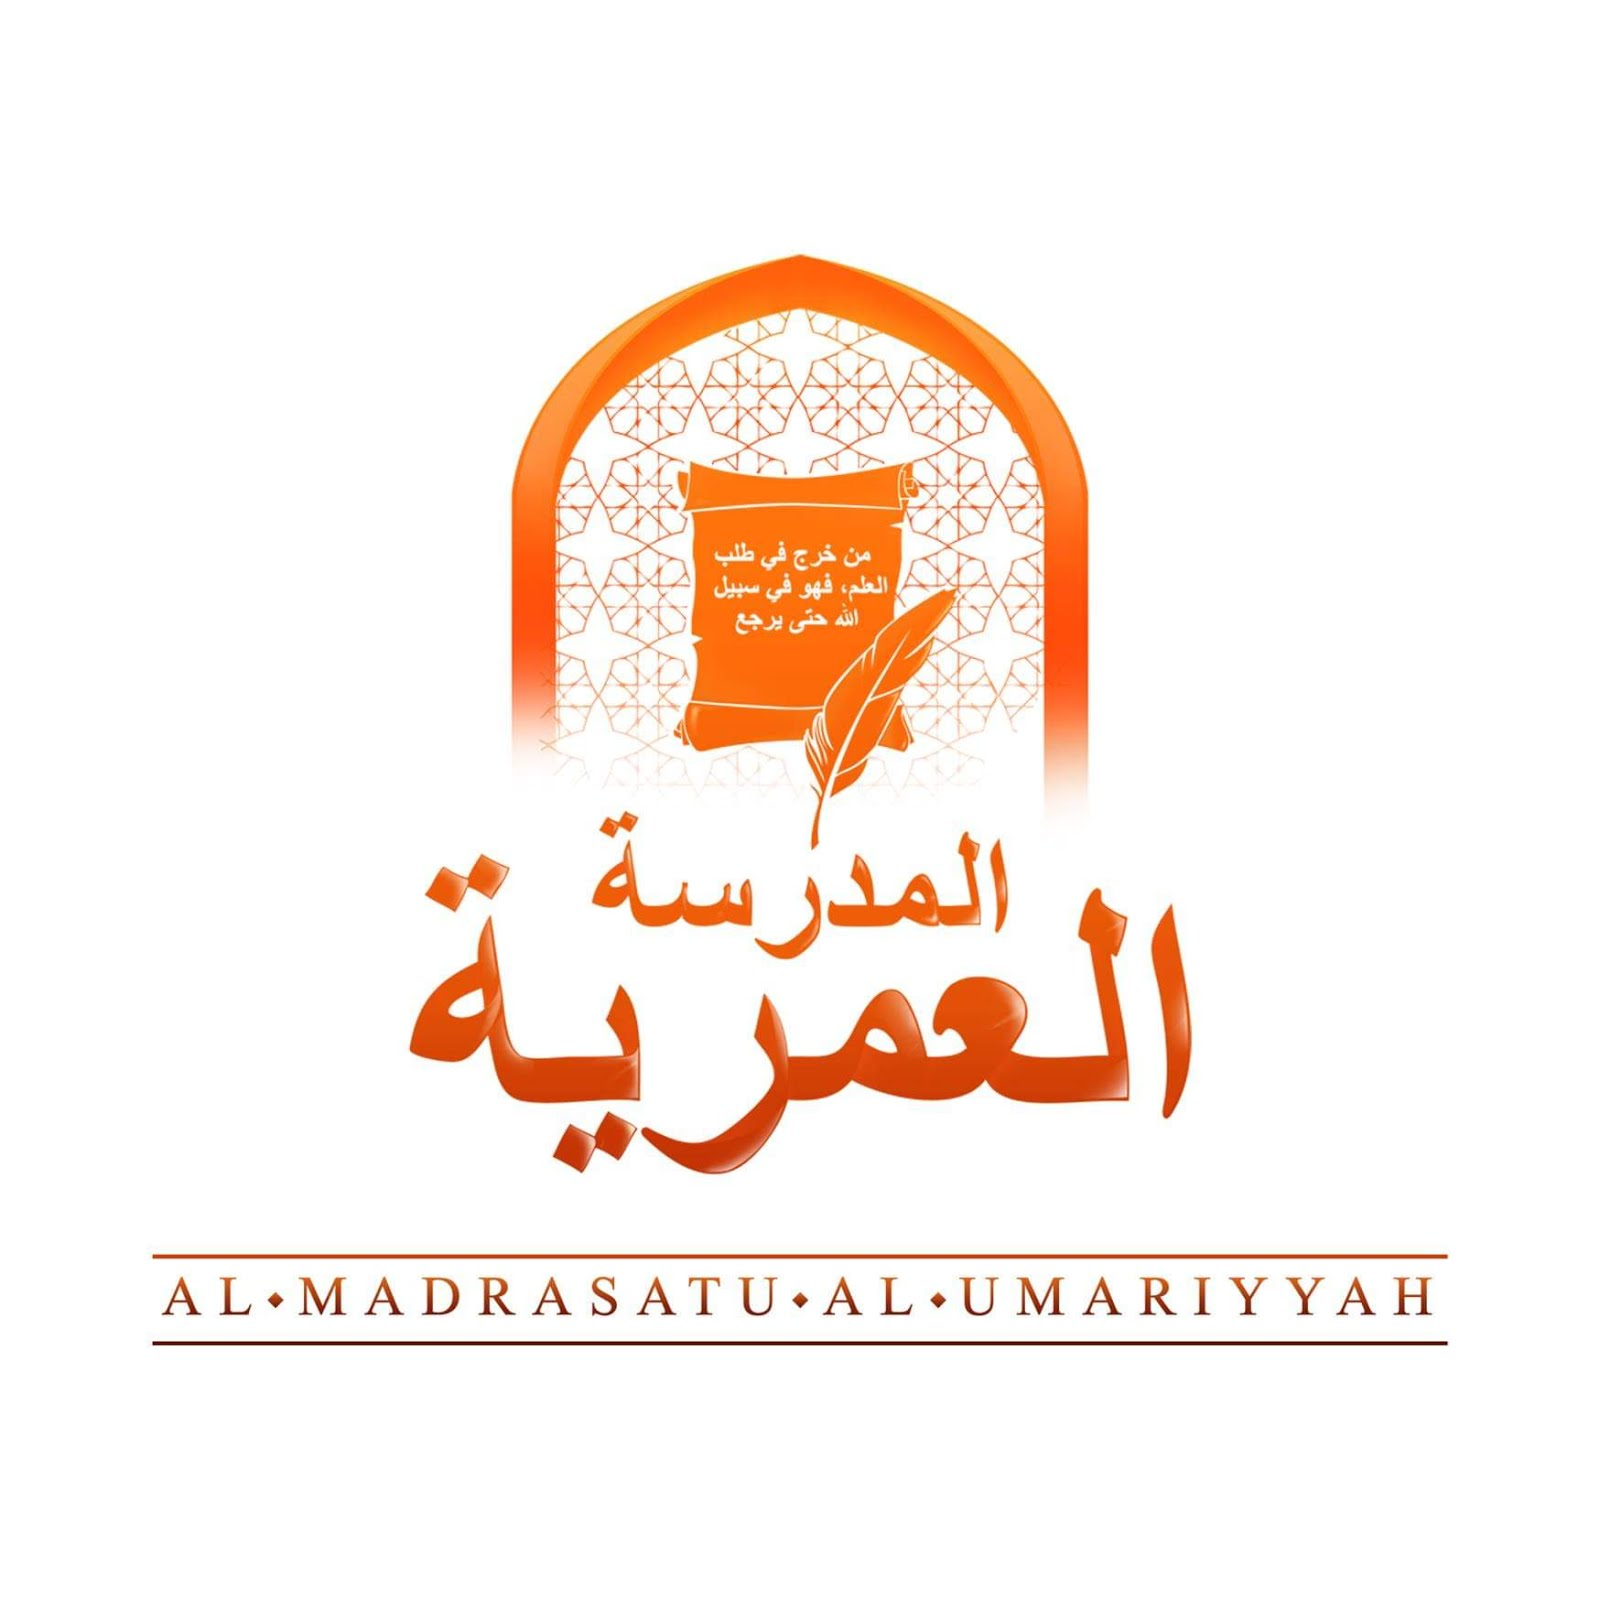 Al-Madrasatu al-Umariyyah